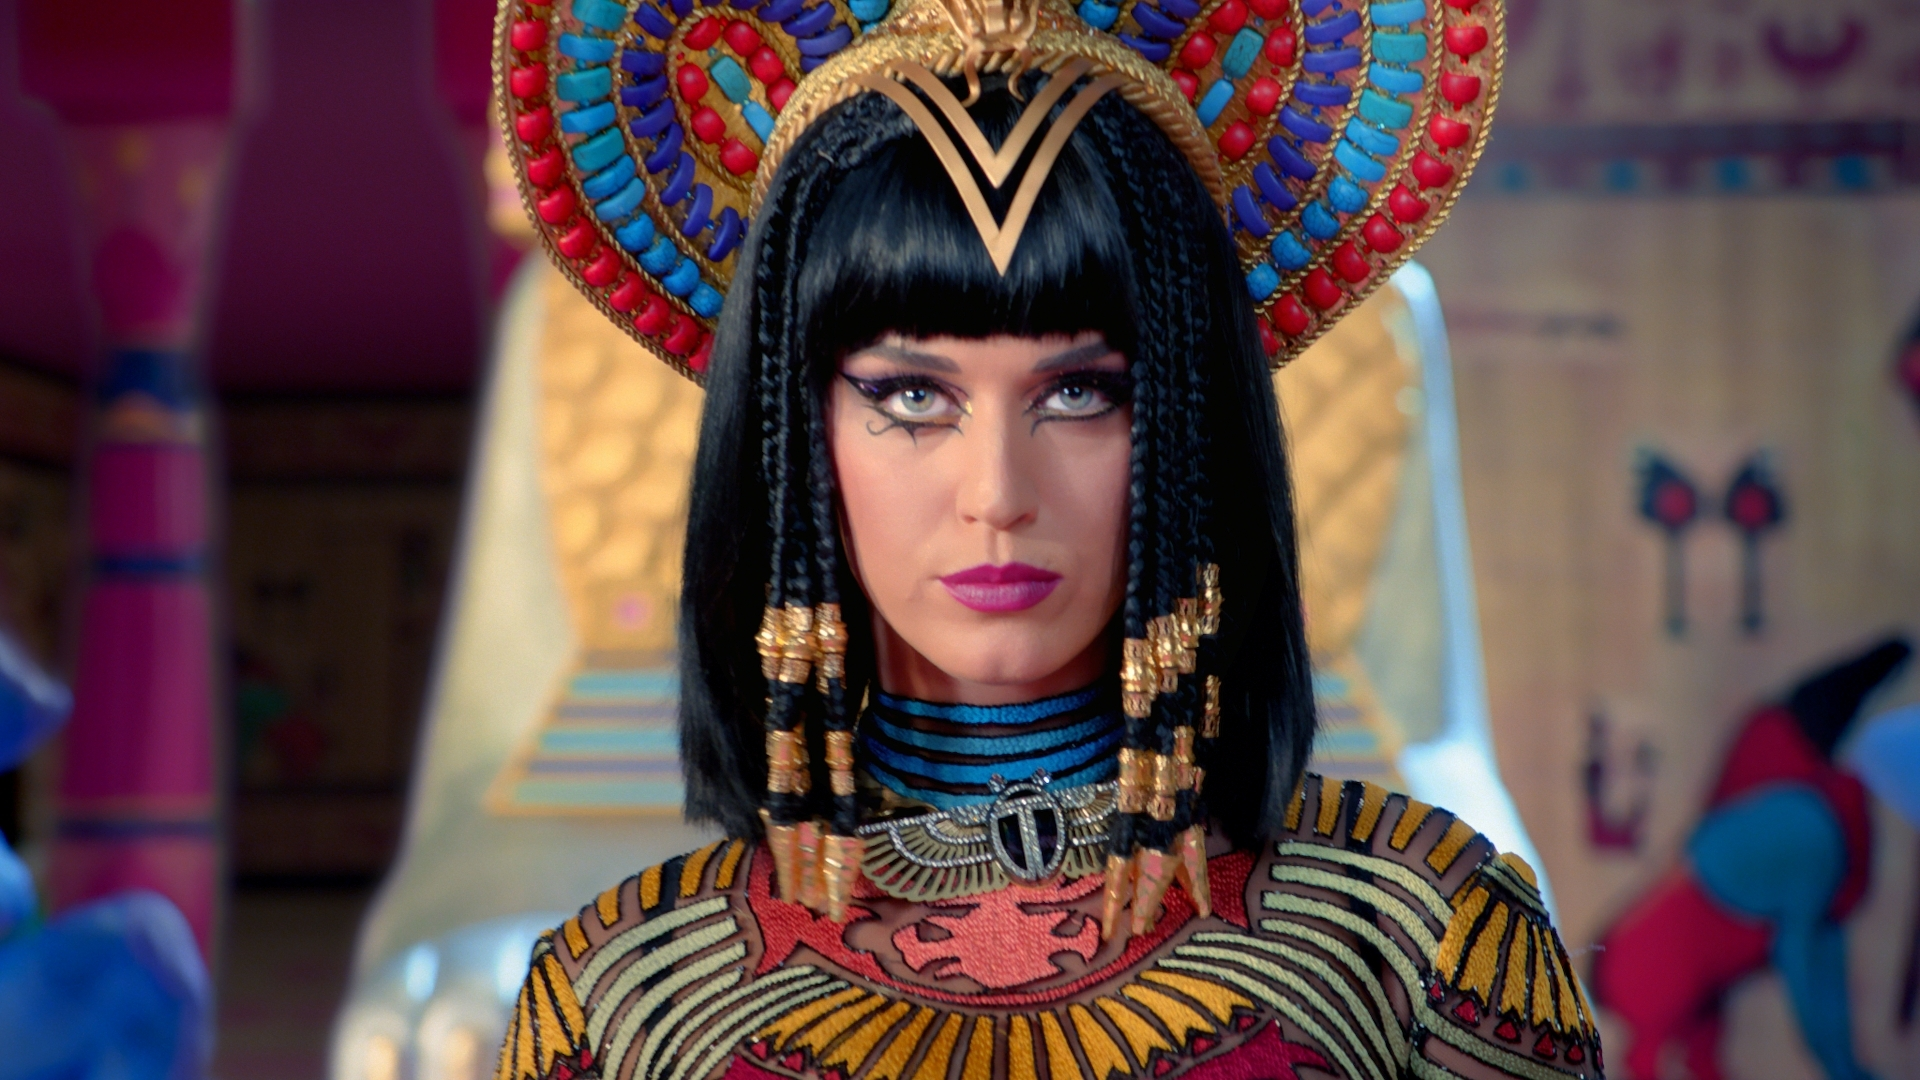 Winning: Katy Perry's 'Dark Horse' Video Hits 1 Billion Views On VEVO - That Grape Juice